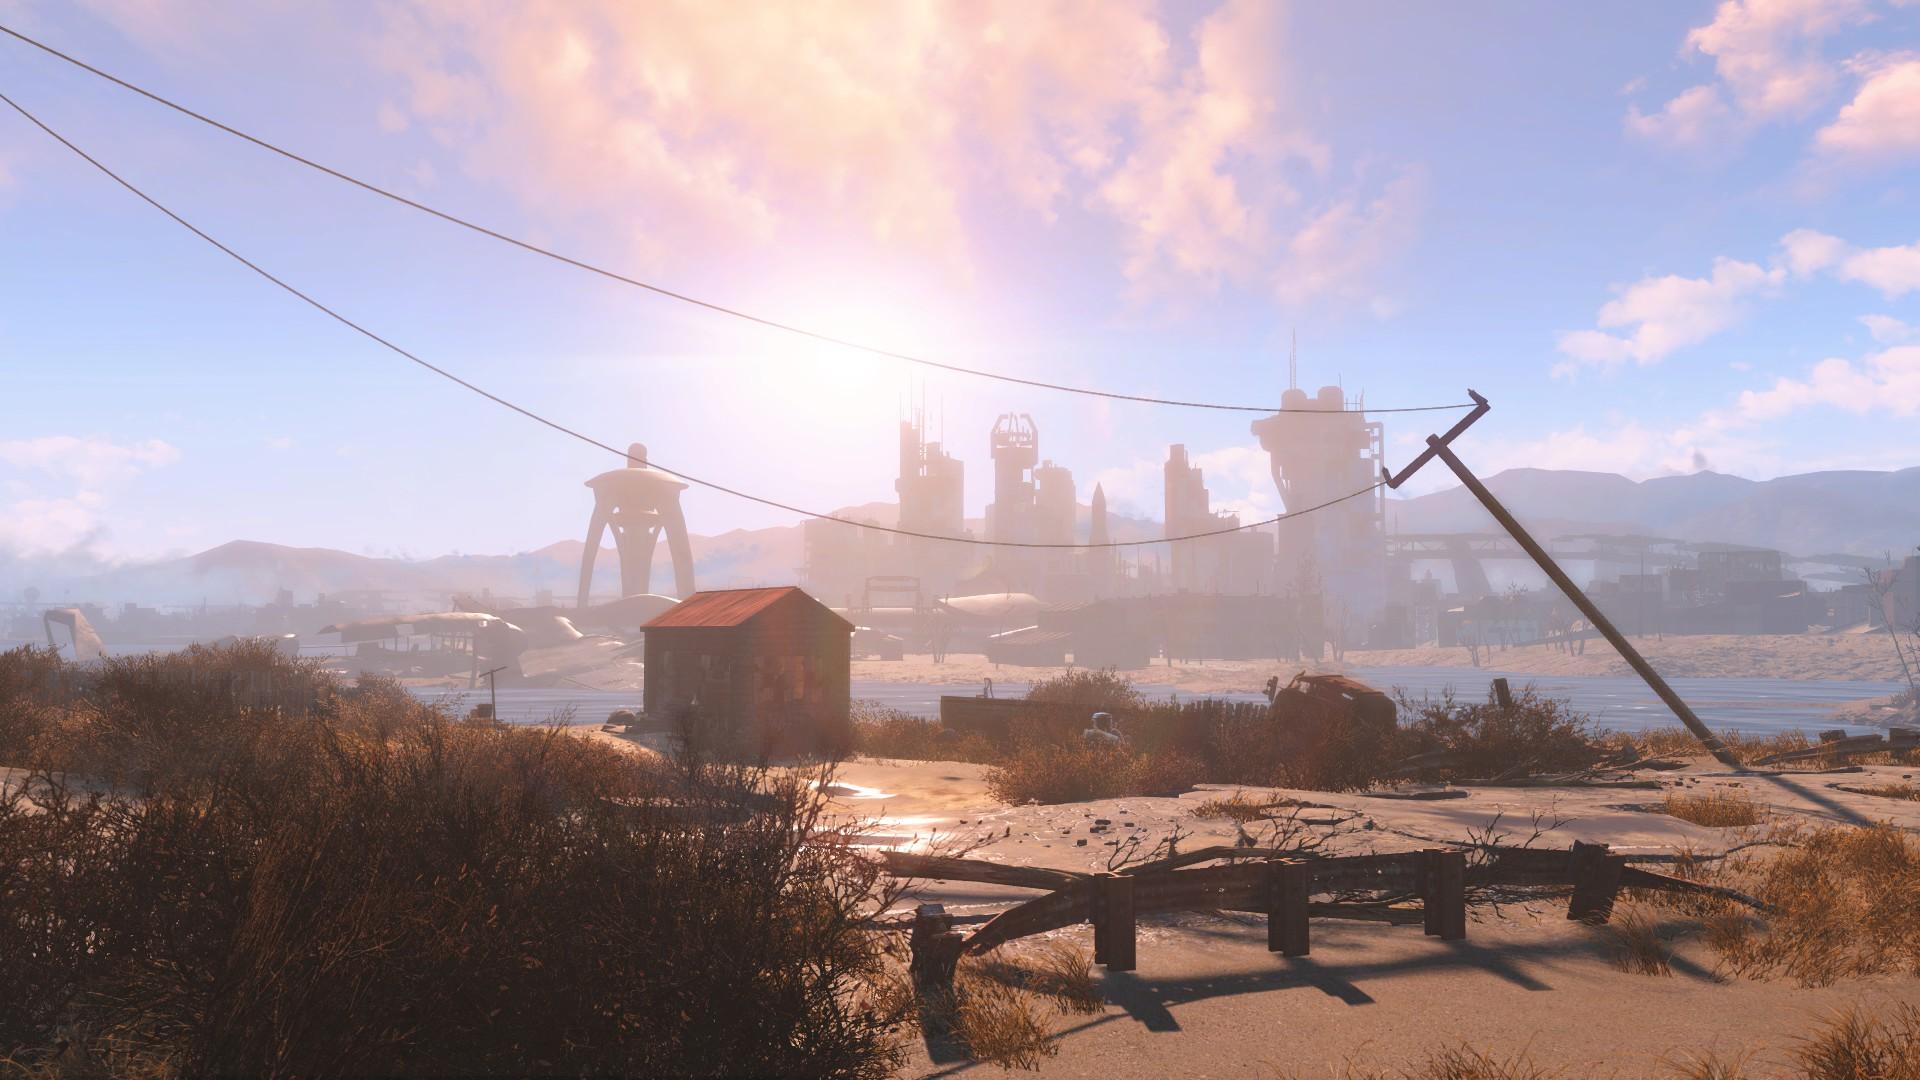 20180209171246_1.jpg - Fallout 4